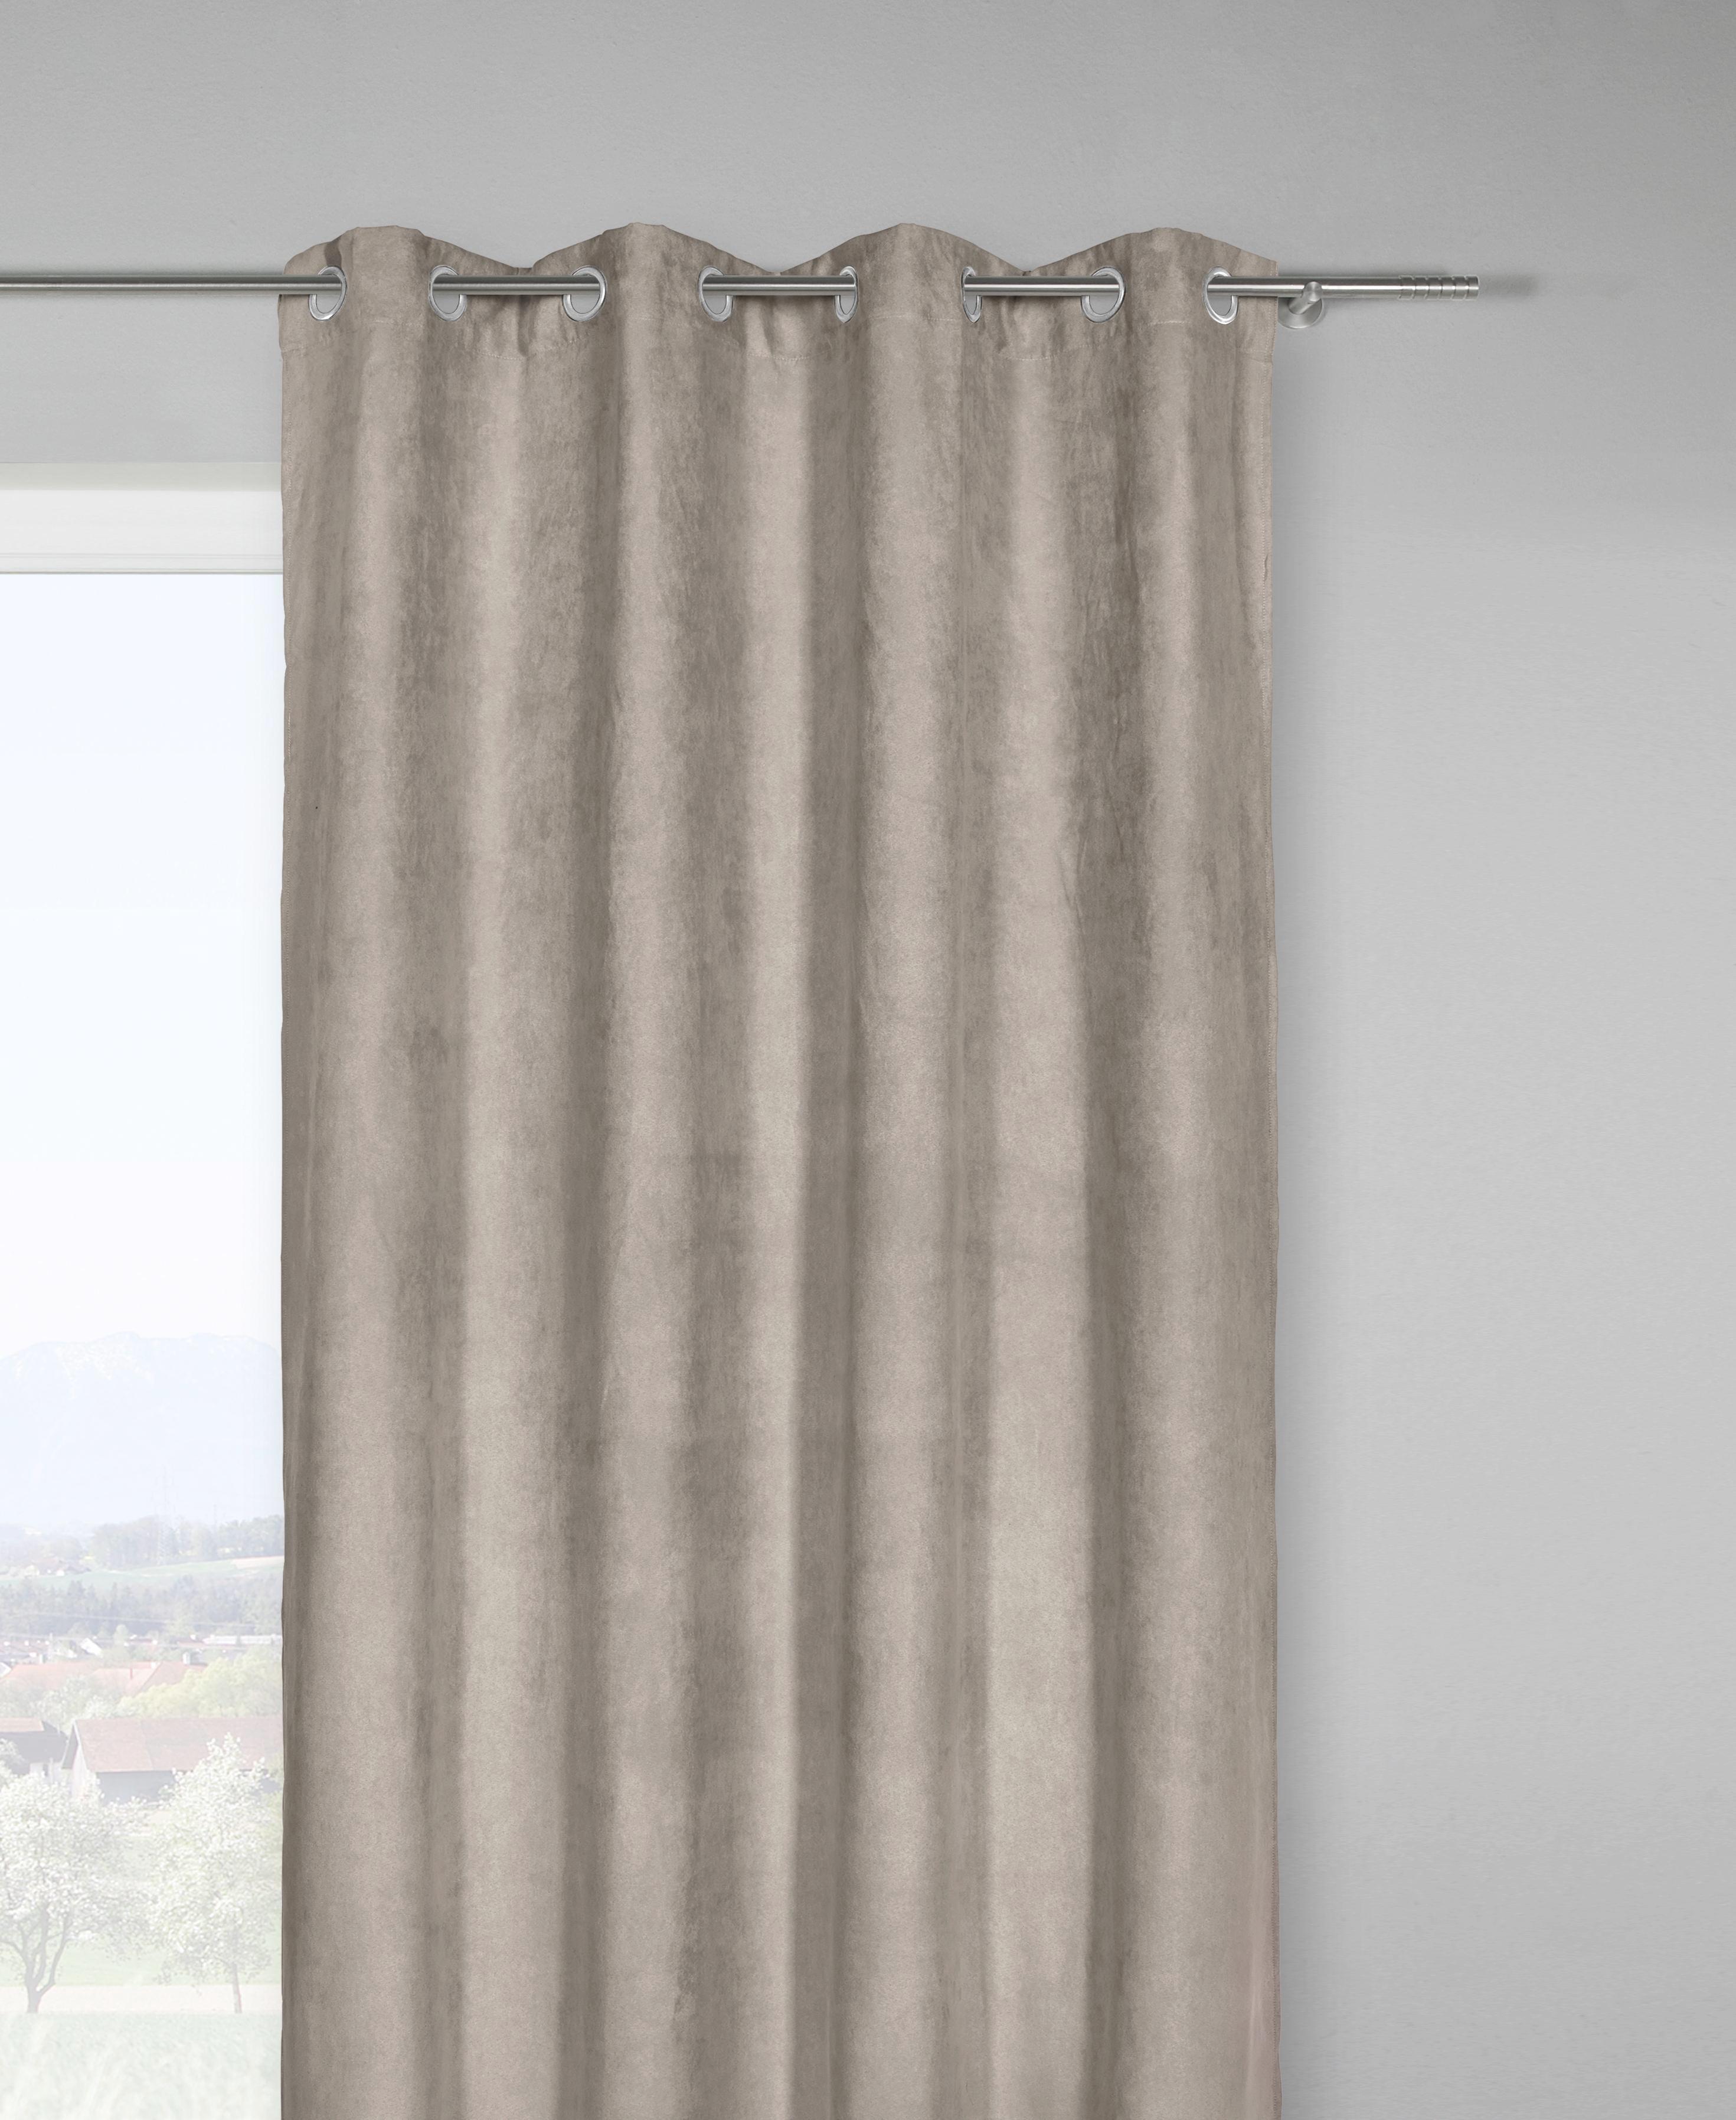 Fertigvorhang Velours in Grau, ca. 140x245cm - Grau, KONVENTIONELL, Textil (140/245cm) - MÖMAX modern living